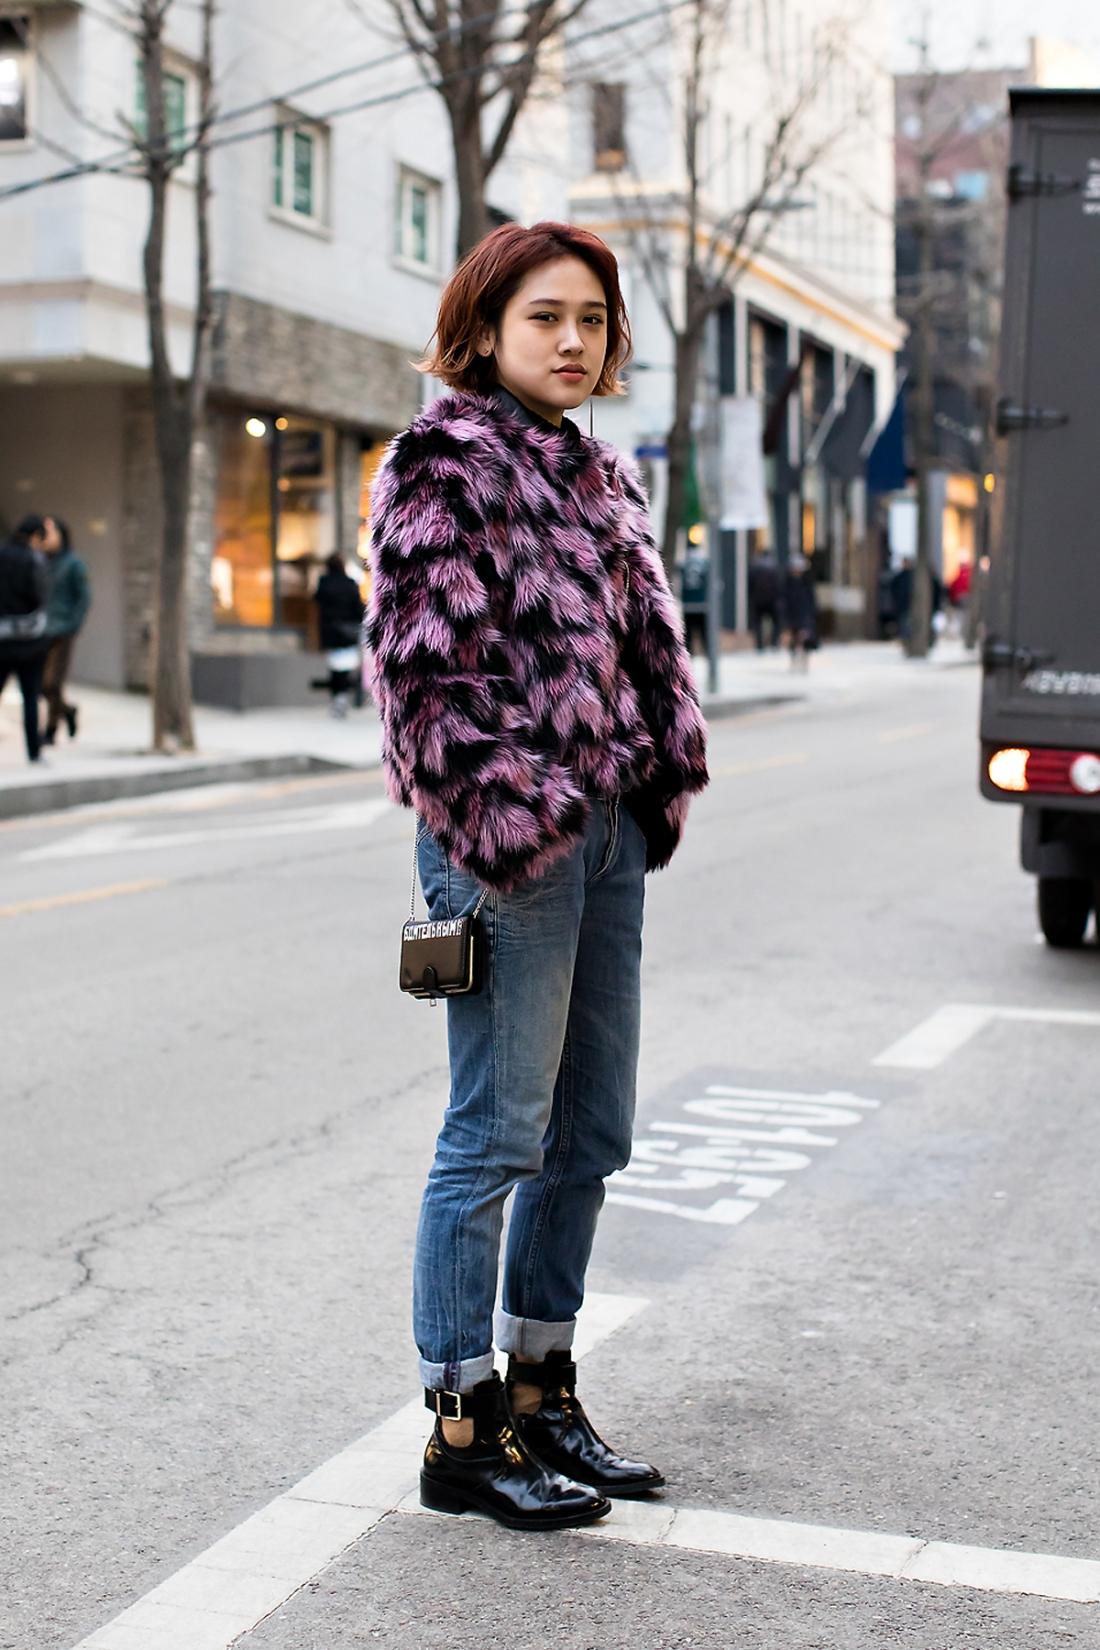 Jung Sohee, Street Fashion SEOUL.jpg